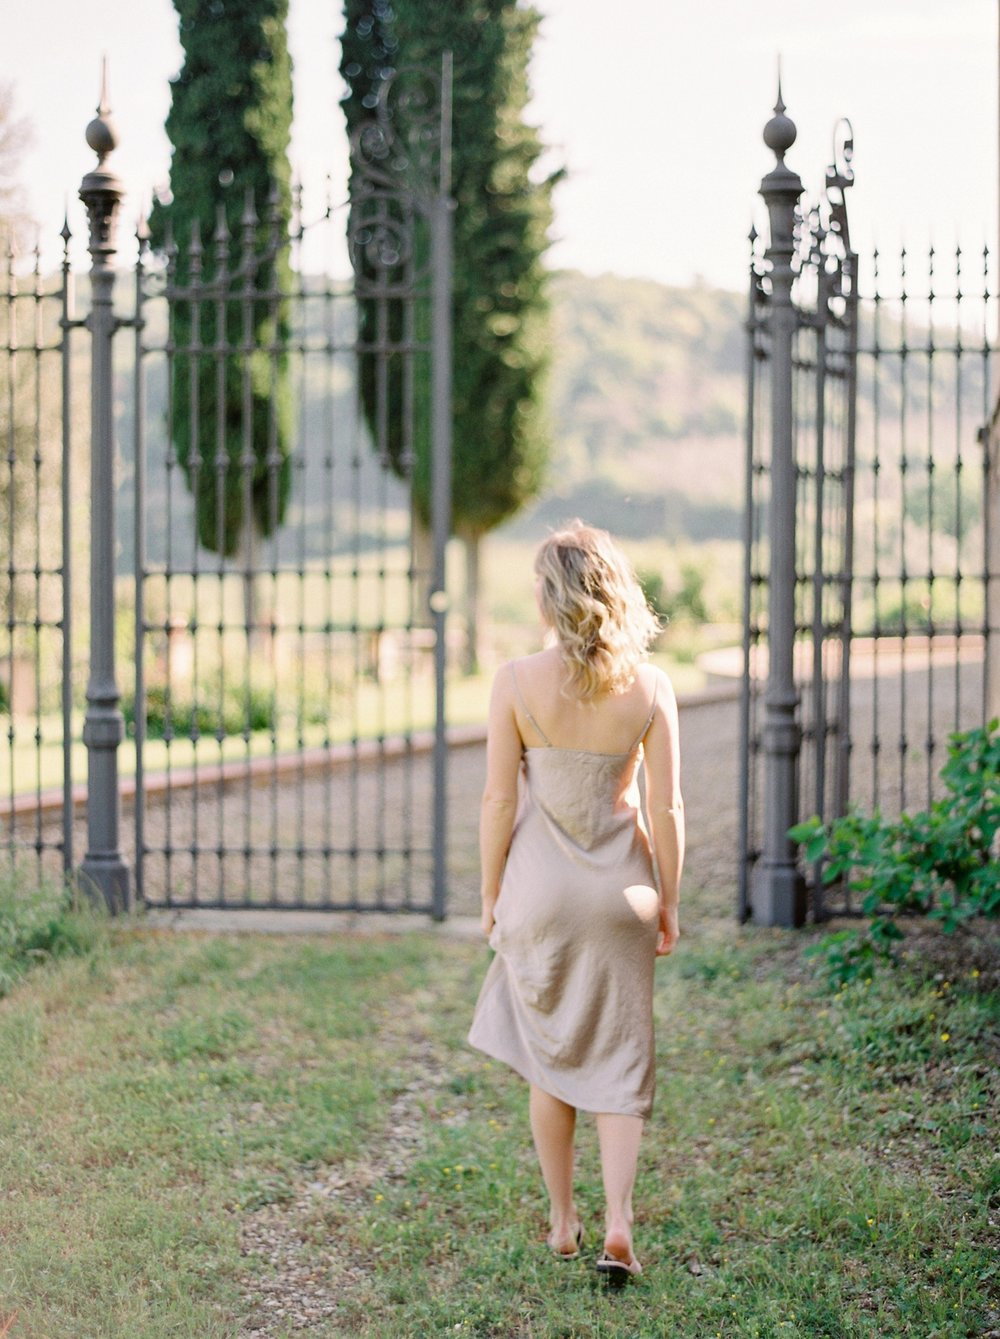 Tuscany Chianti fashion and travel photographers | justine milton fine art film photographer